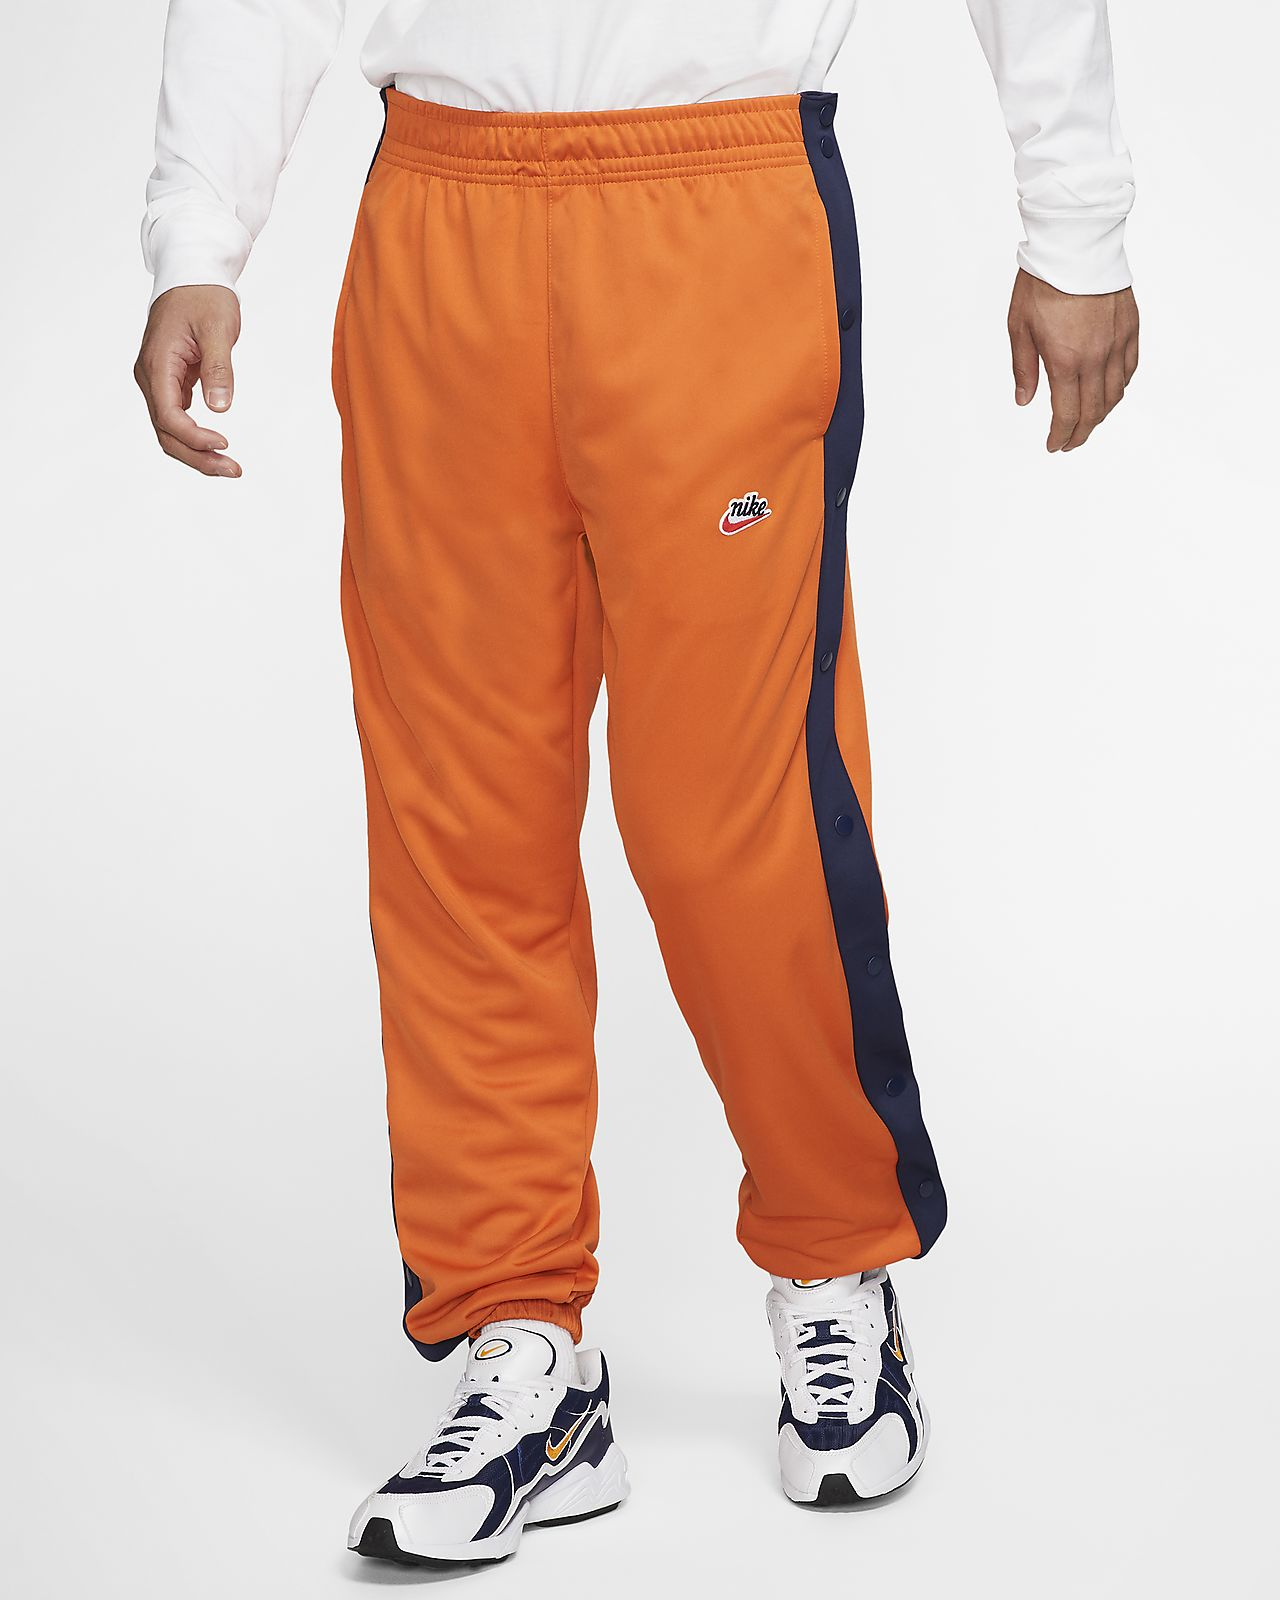 Nike Sportswear-tearaway-bukser til mænd